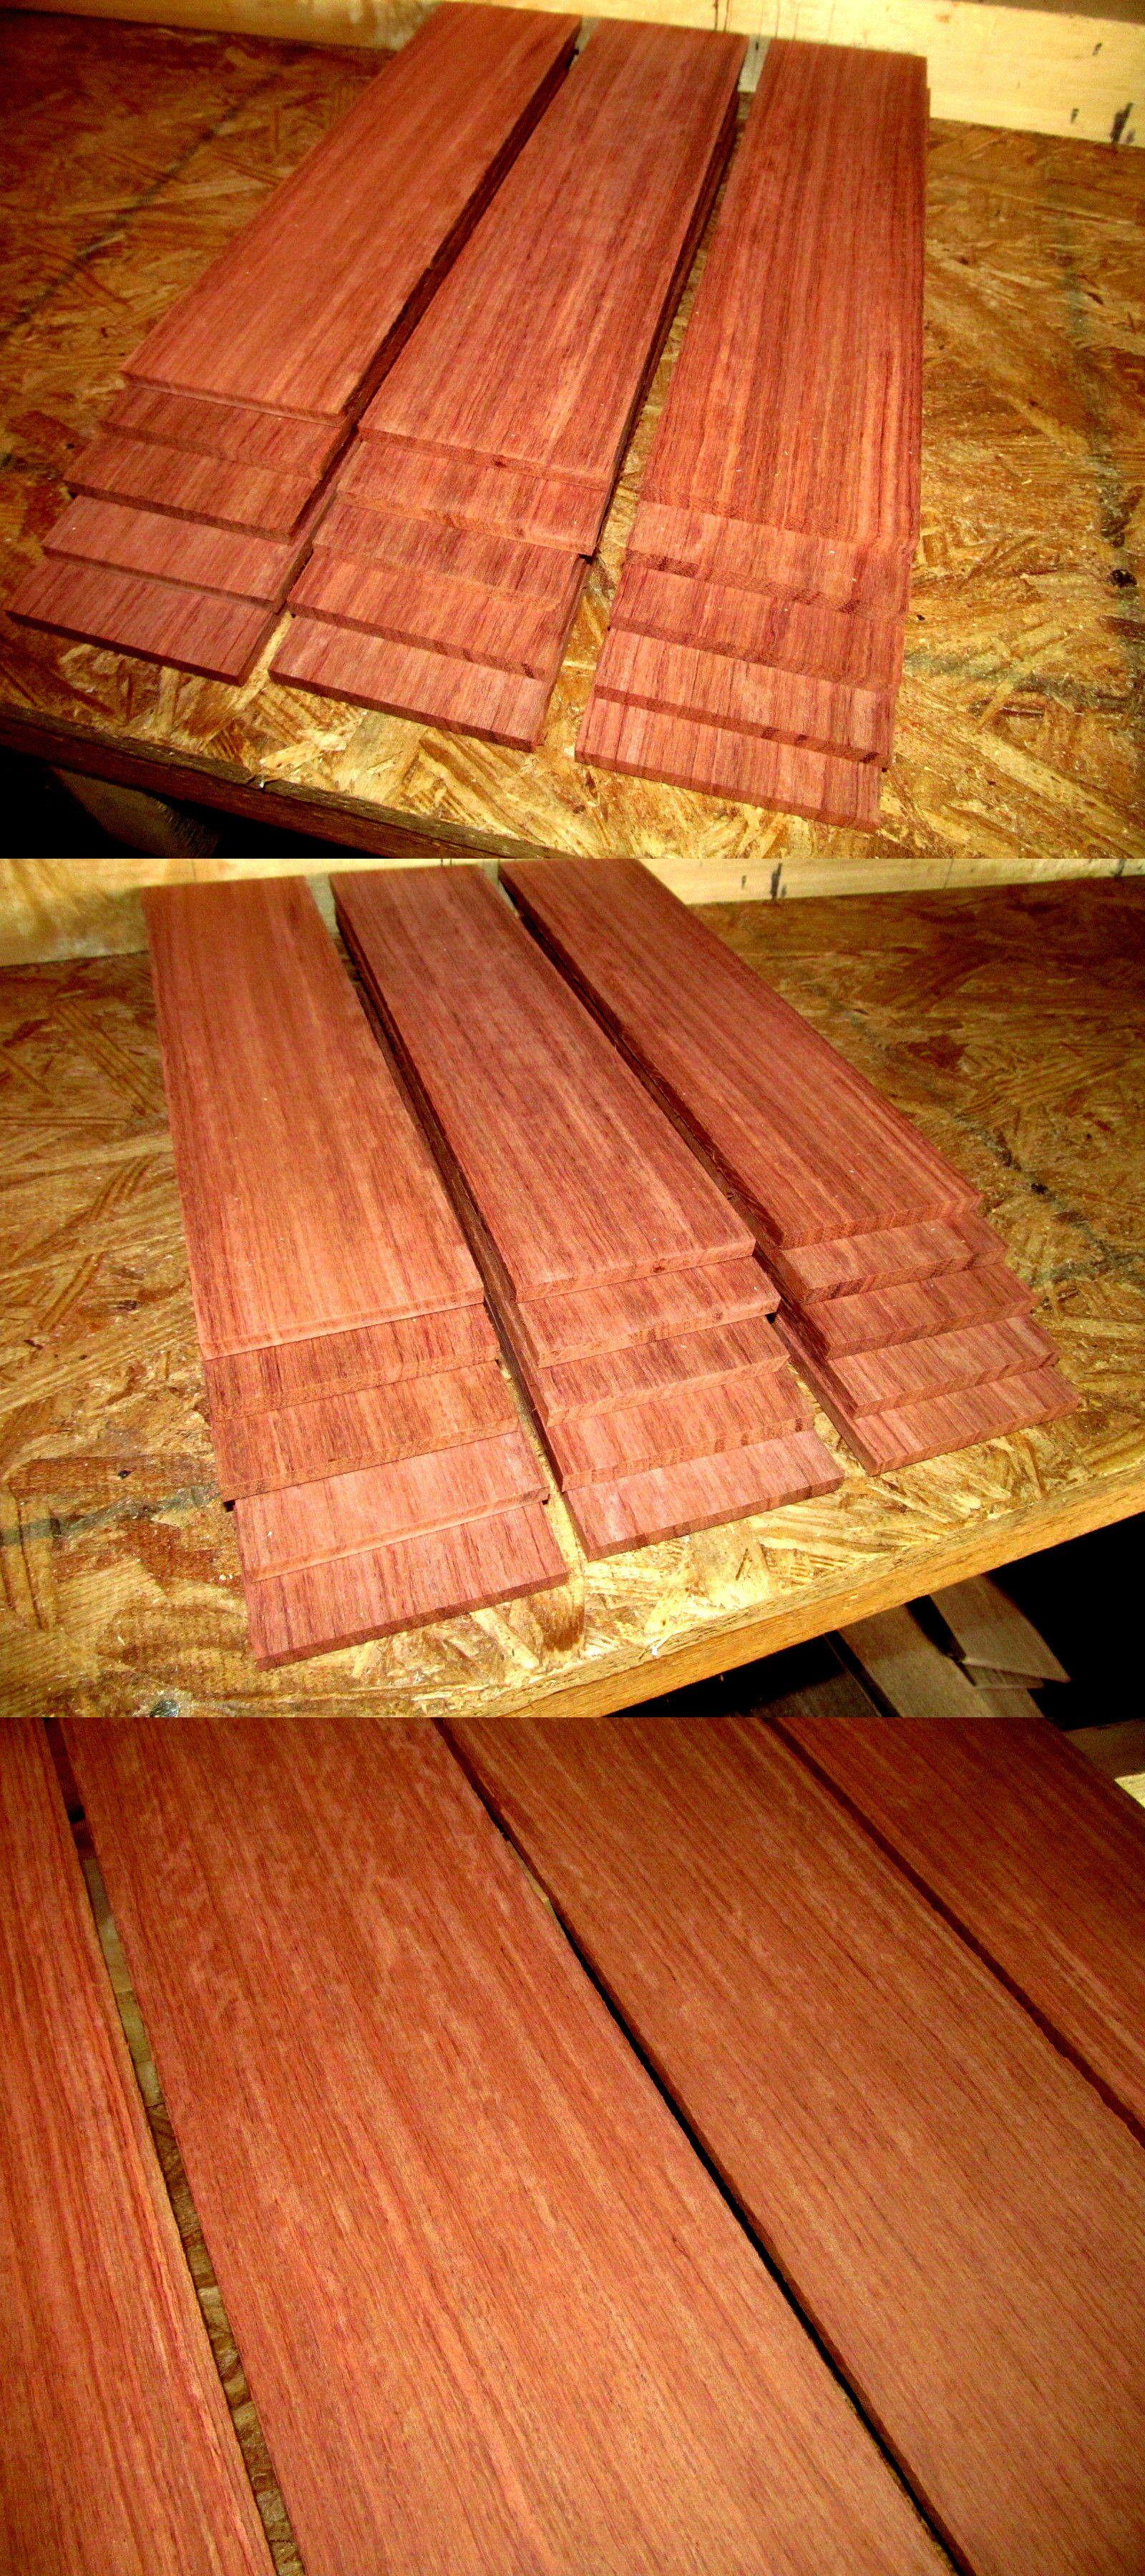 Woodworking Lumber 84011 Sixteen 16 Beautiful Sanded Kiln Dried Thin Pieces Bubinga Wood 12 X 3 X 1 4 Buy It Now Only 39 95 On Wood Bubinga Woodworking